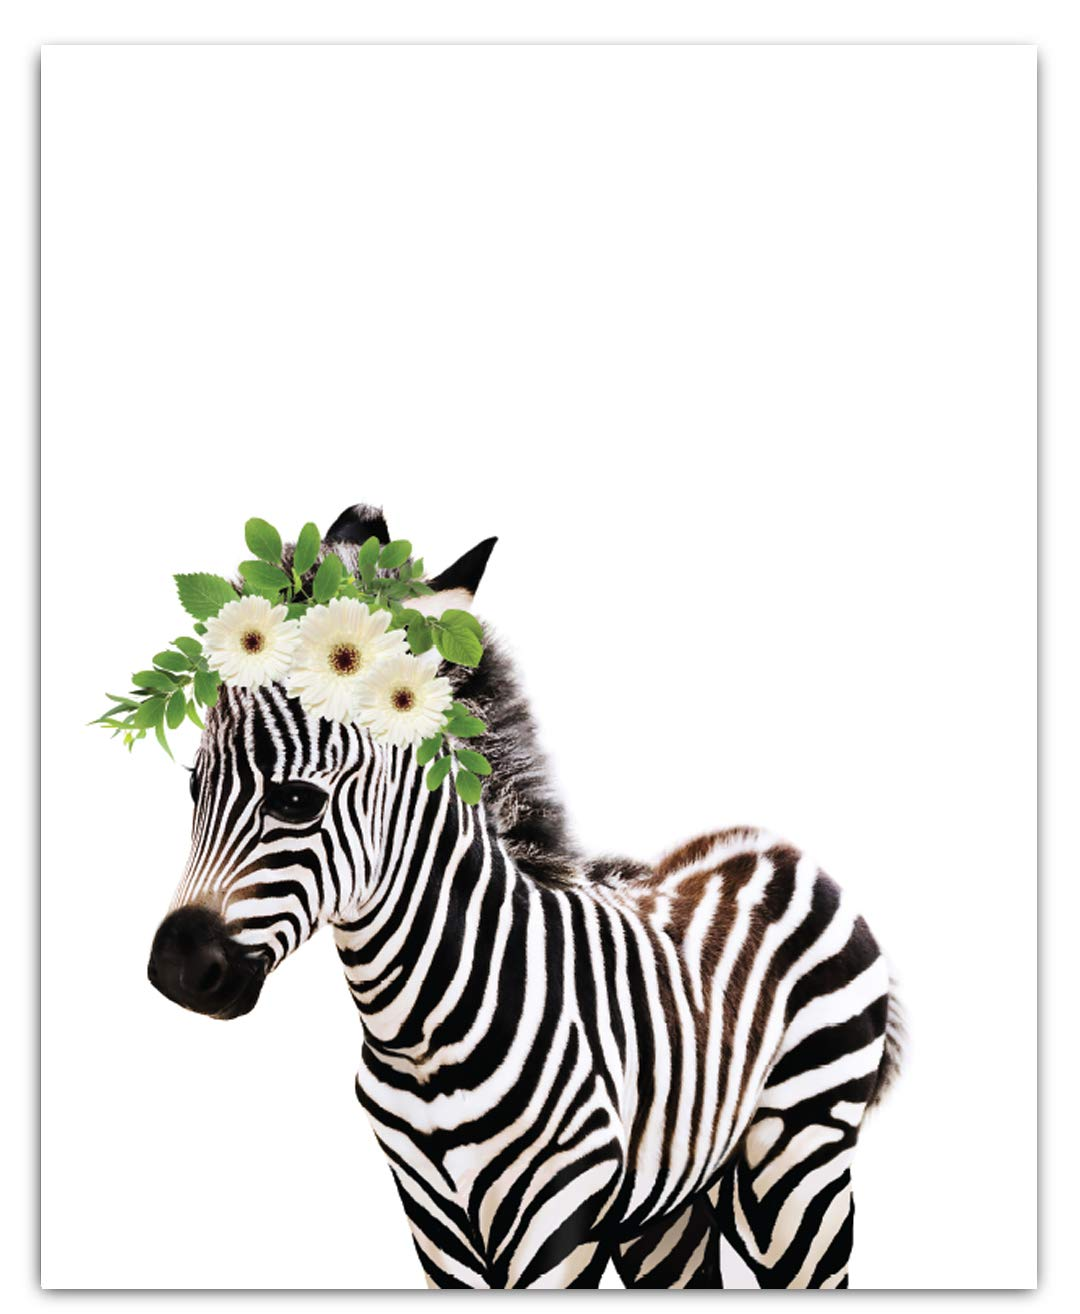 Option 2 Floral Crown Nursery Decor Art Set of 4 UNFRAMED Wall Prints 8x10 Designs by Maria Inc